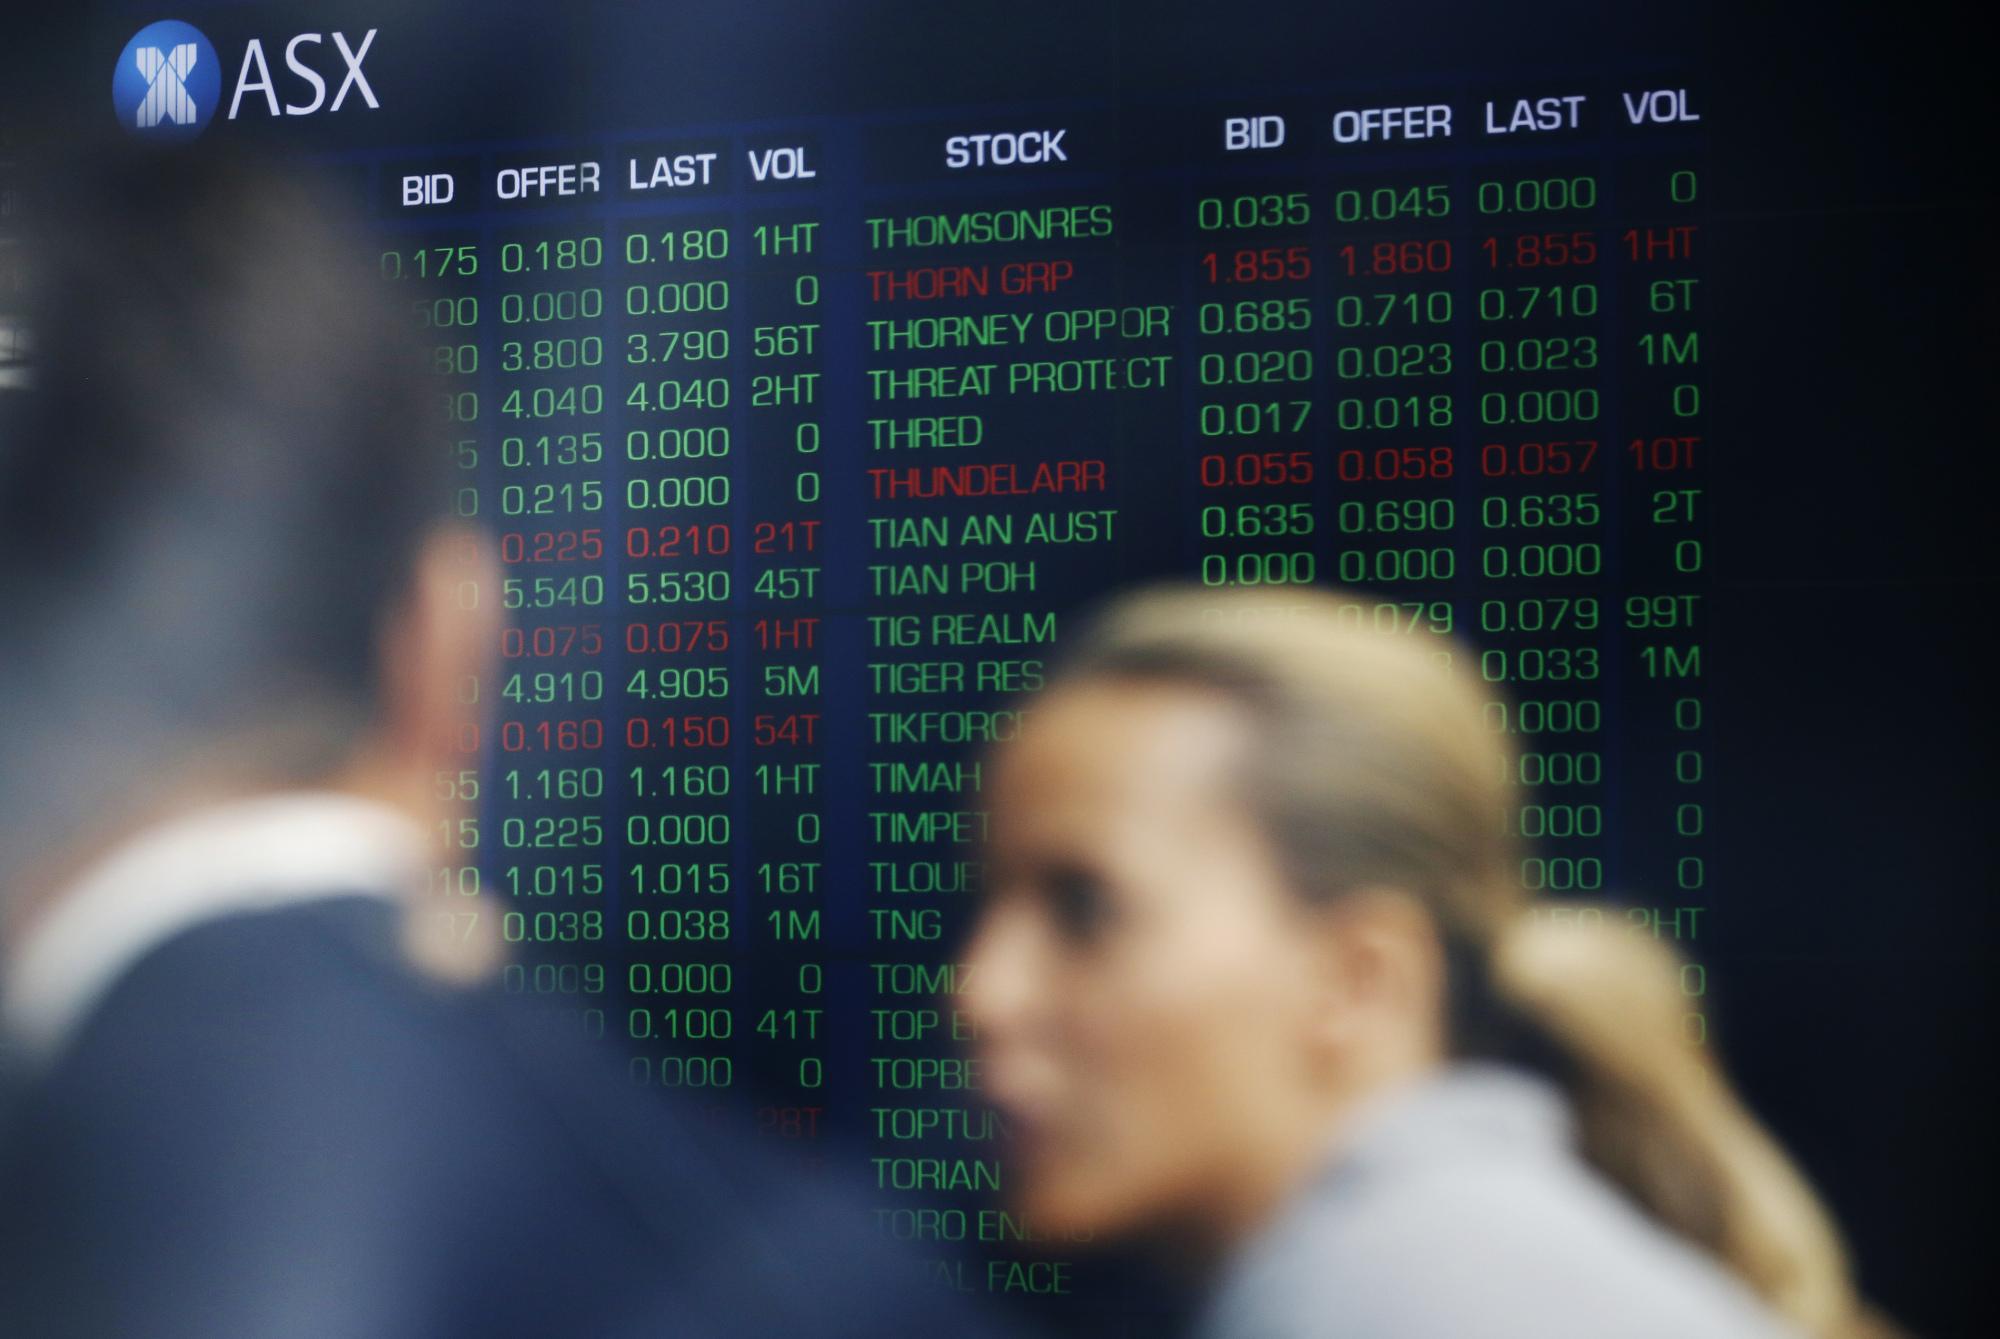 bloomberg.com - Adam Haigh - Asia Stocks to Build on Rally; Treasuries Steady: Markets Wrap